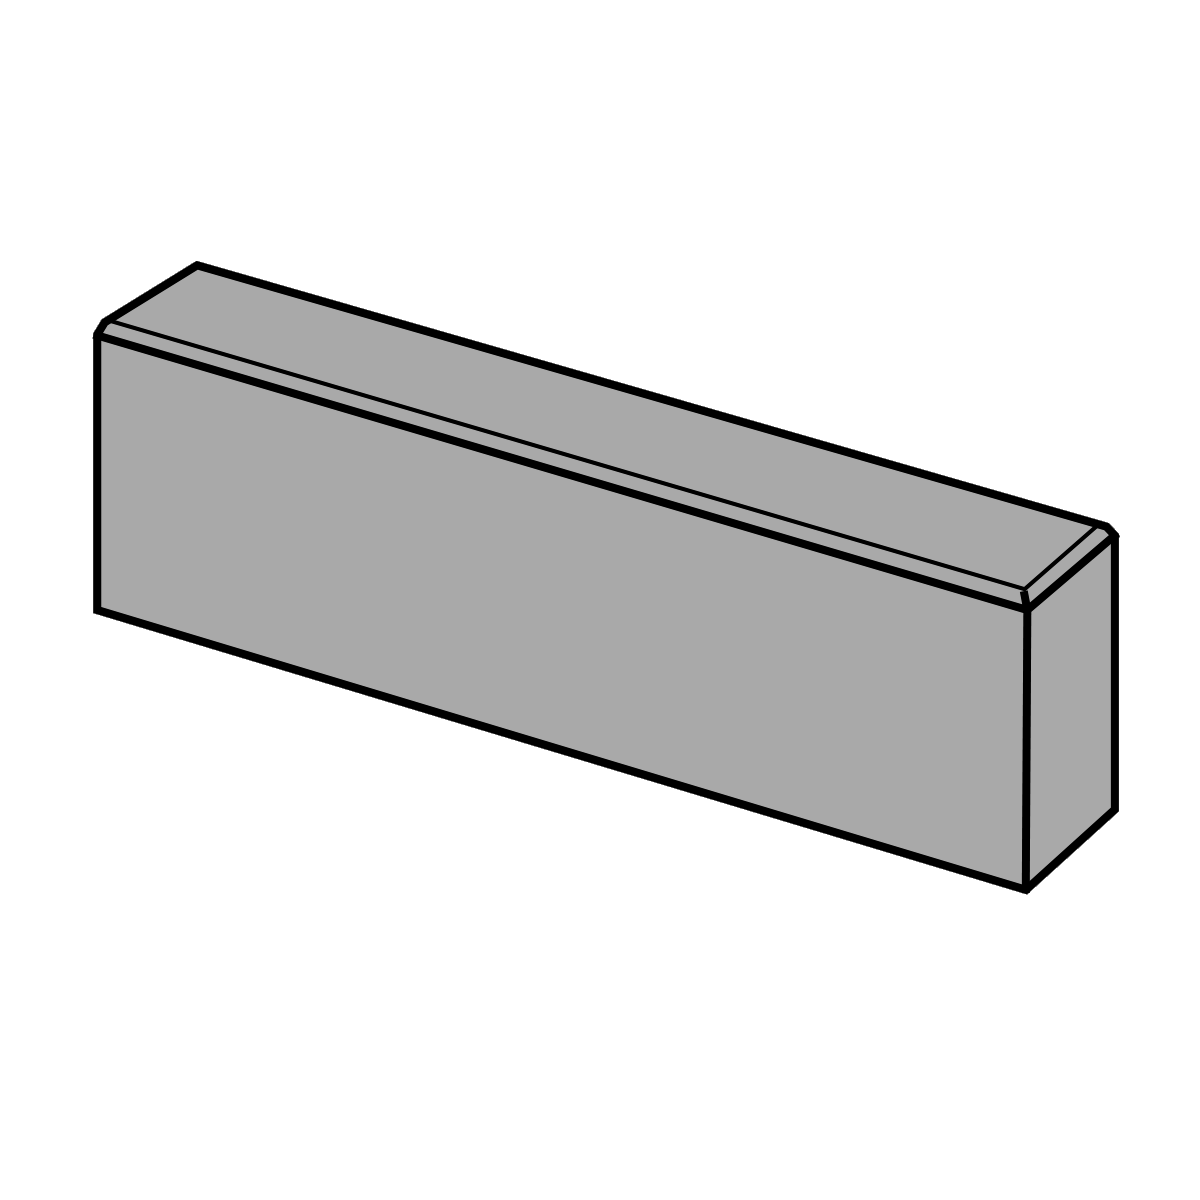 Kantningssten 10x18x60 cm Sort/Antracit